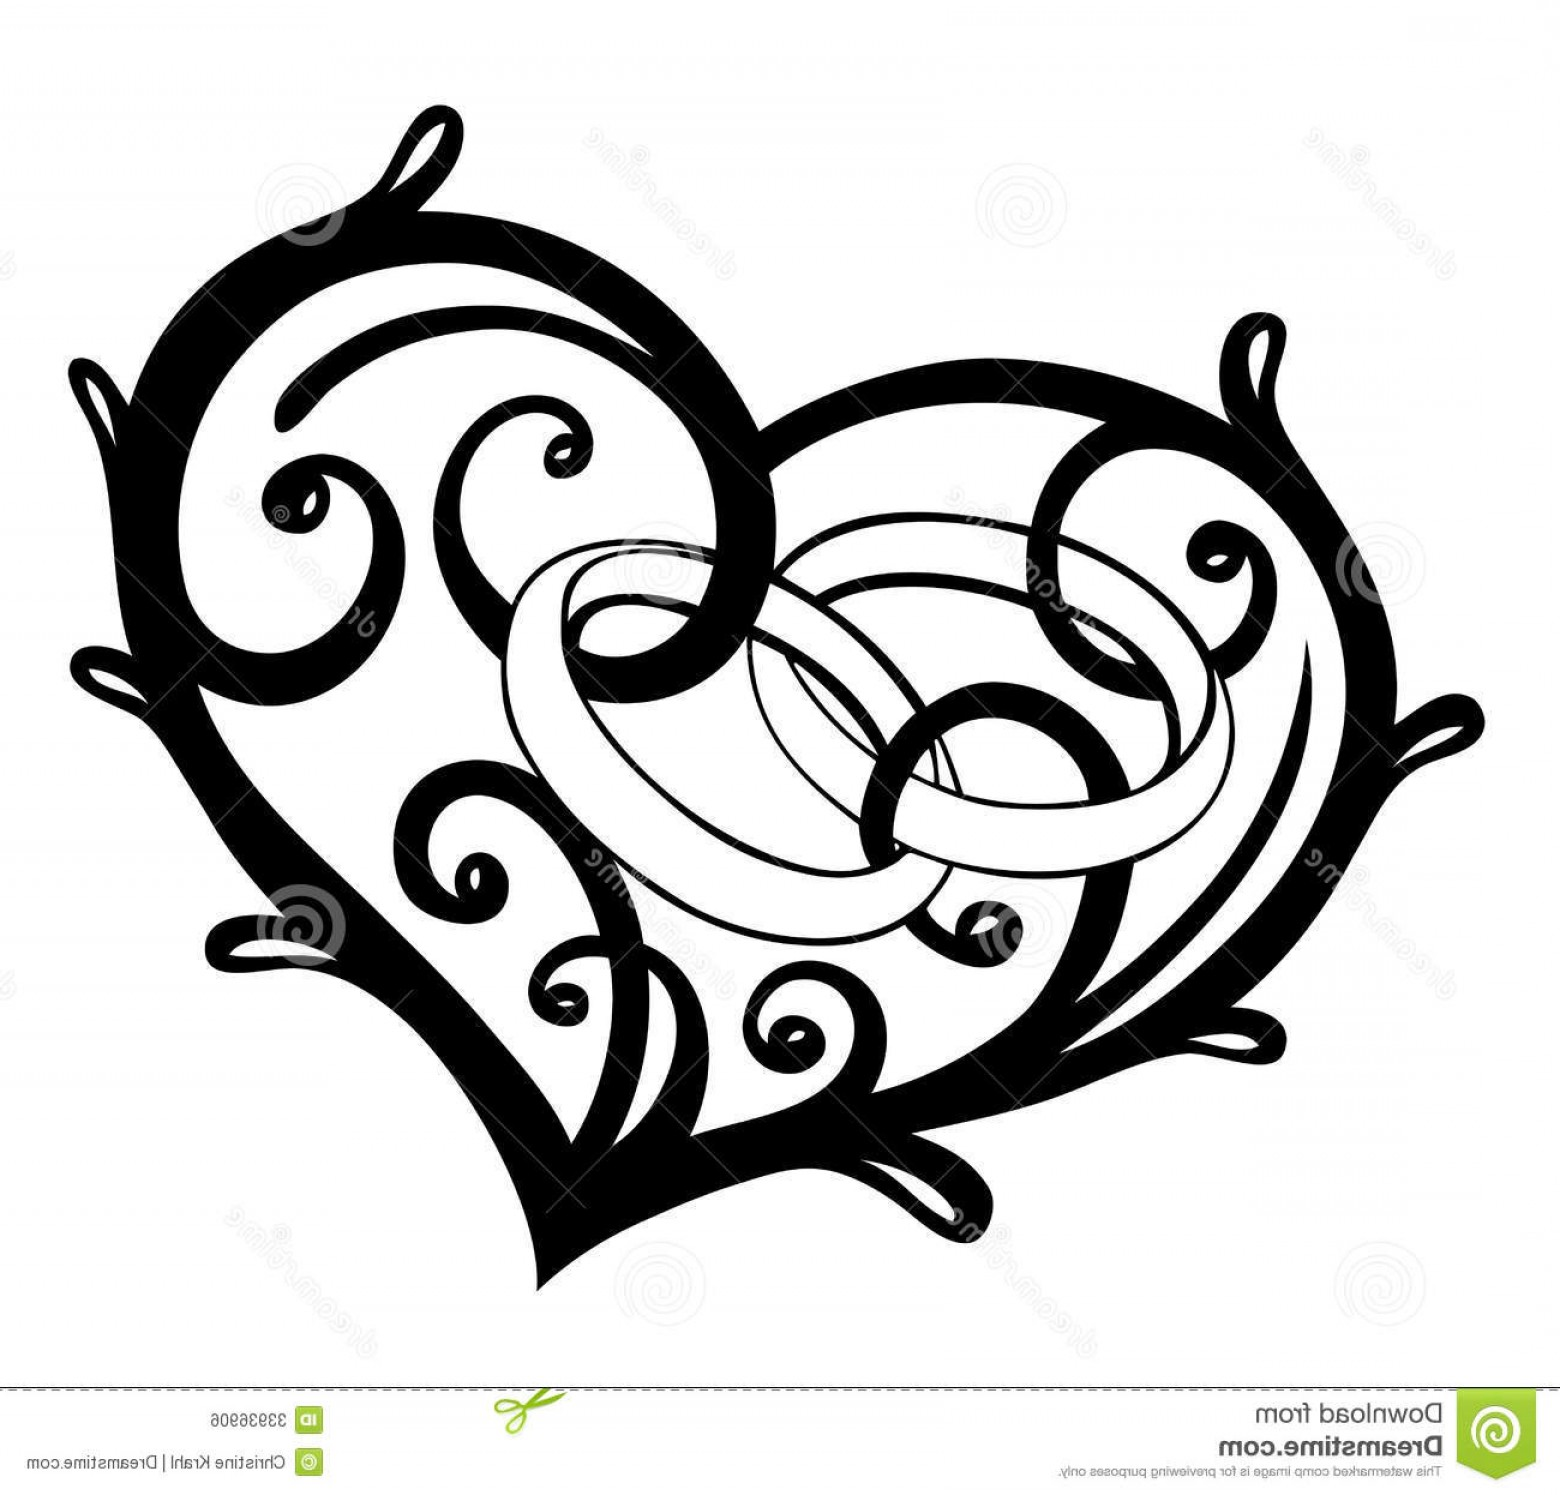 1560x1495 Wedding Rings Vector Silhouette Caymancode